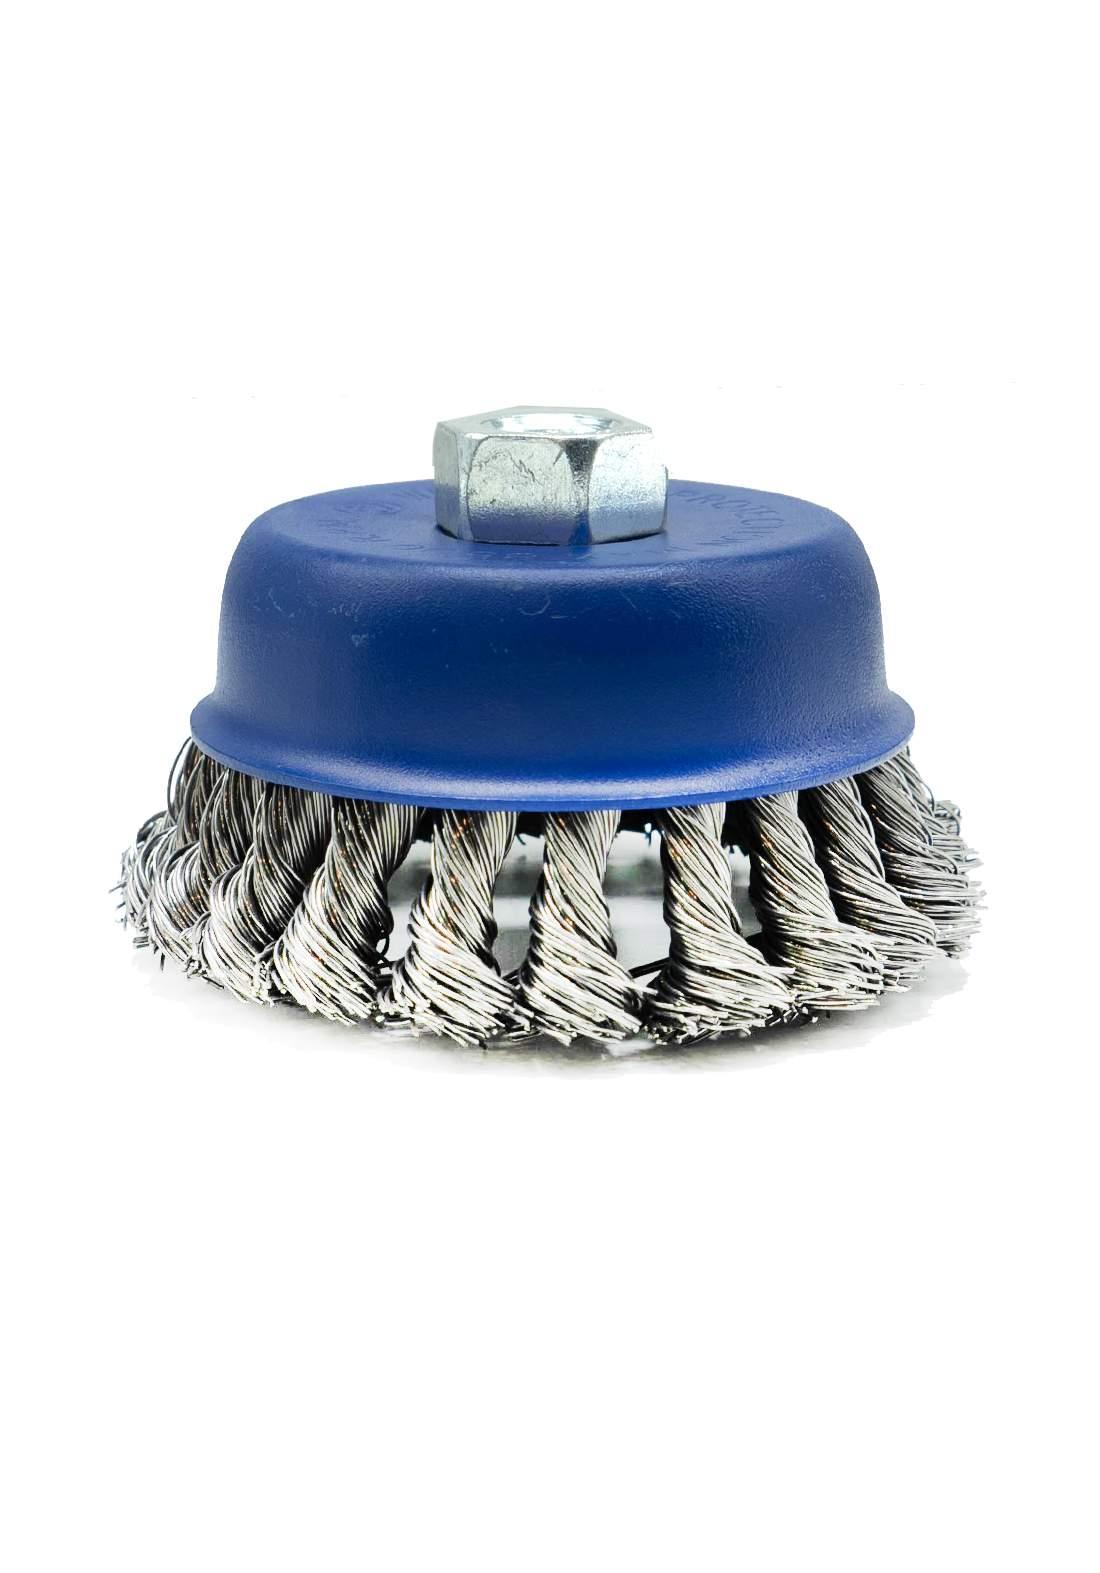 Sali 7223 Brush Inox For Drilling Machine 100 mm فرشاة تنظيف الاسطح المعدنية